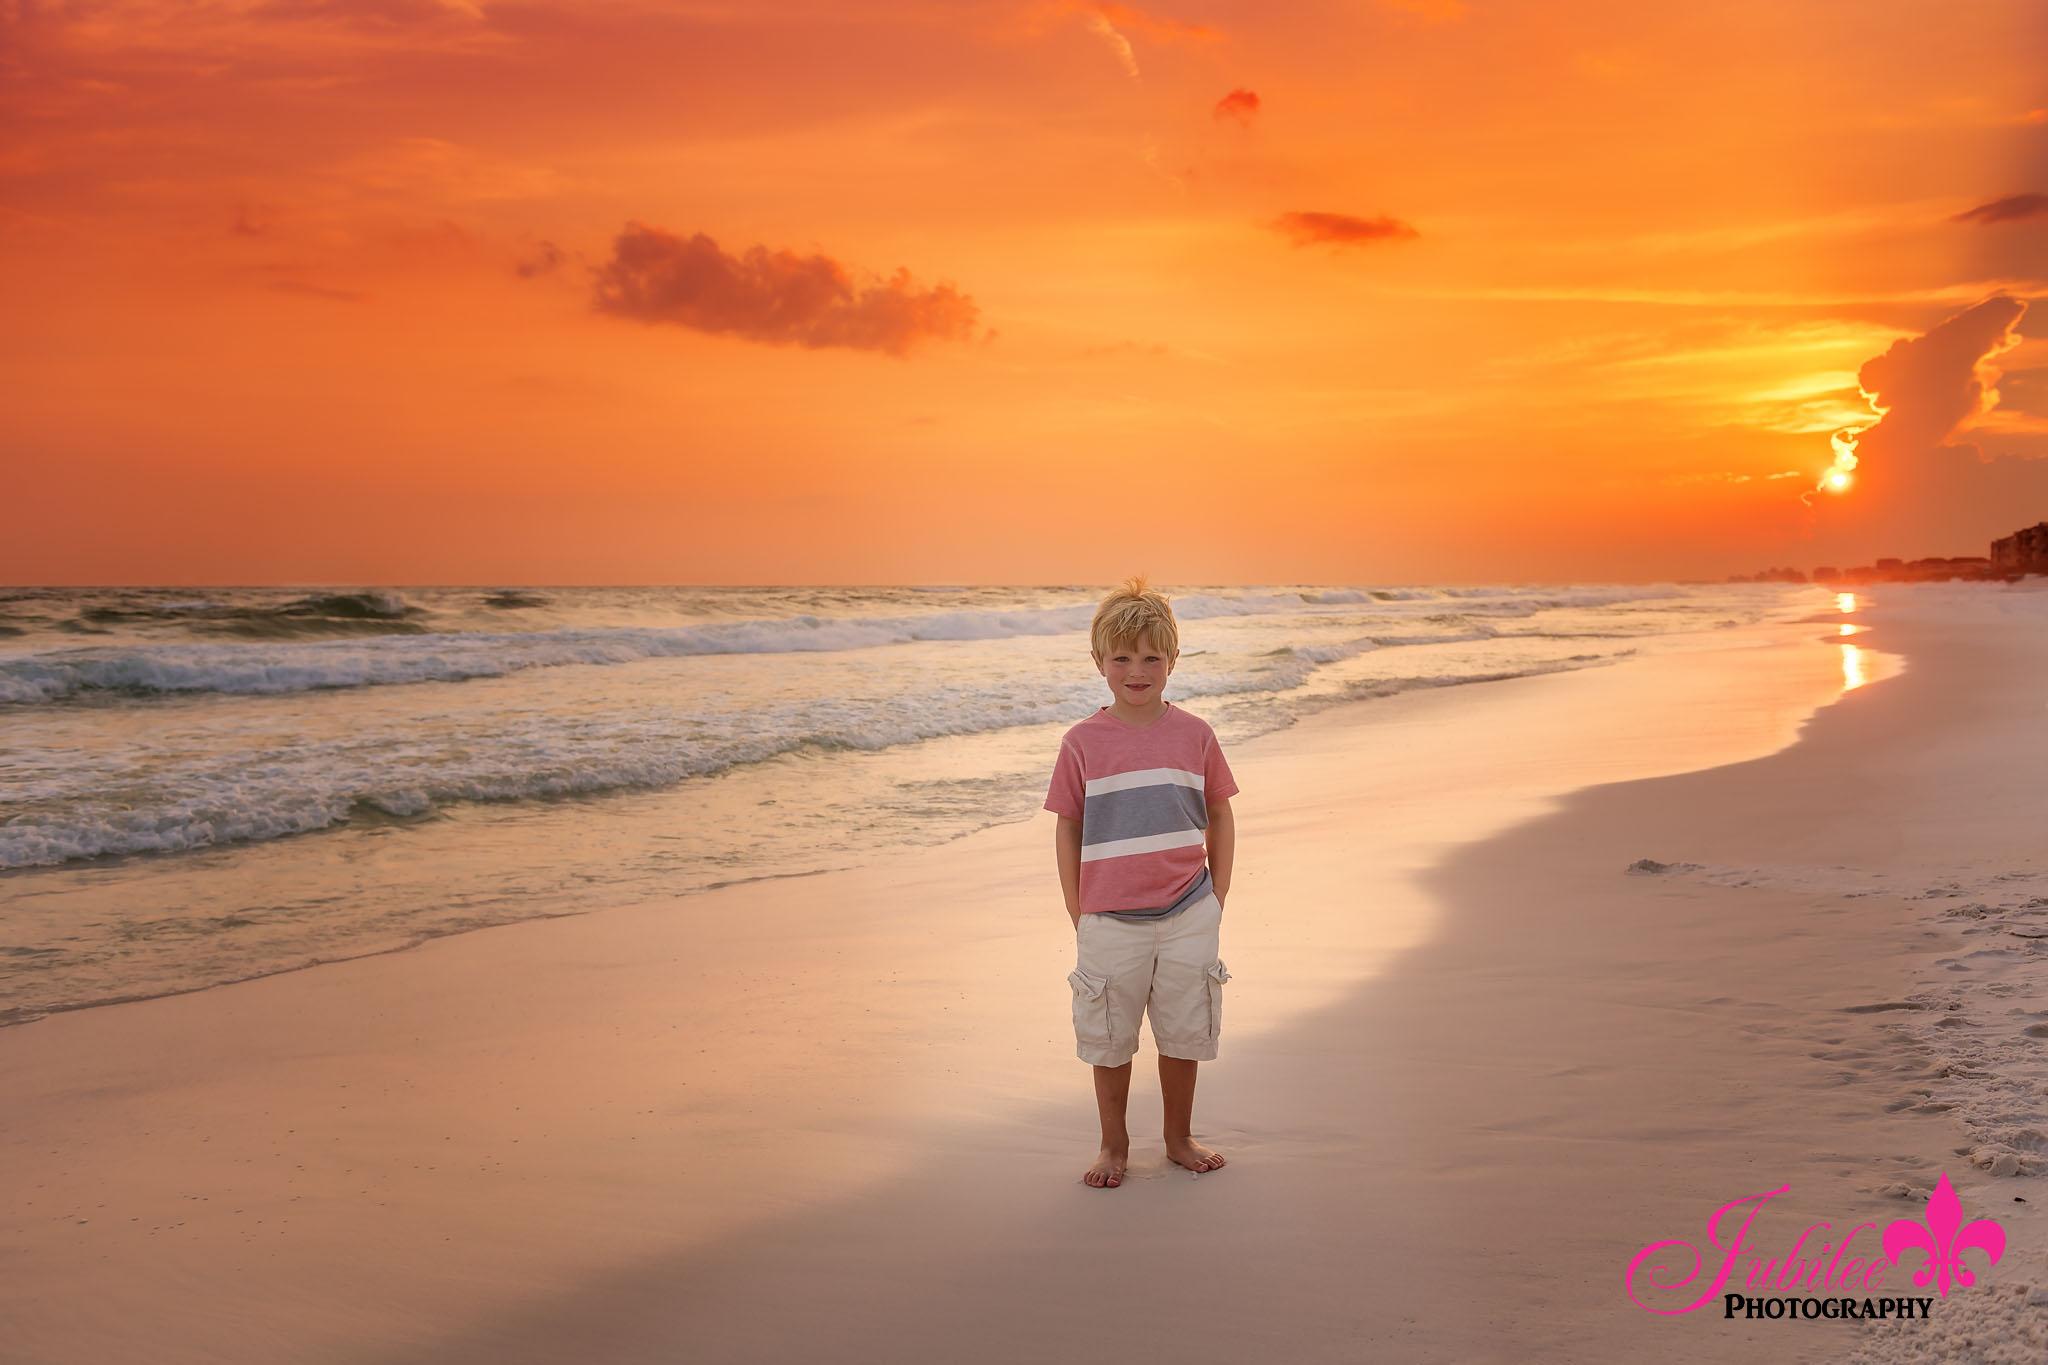 destin_beach_photographer_6205